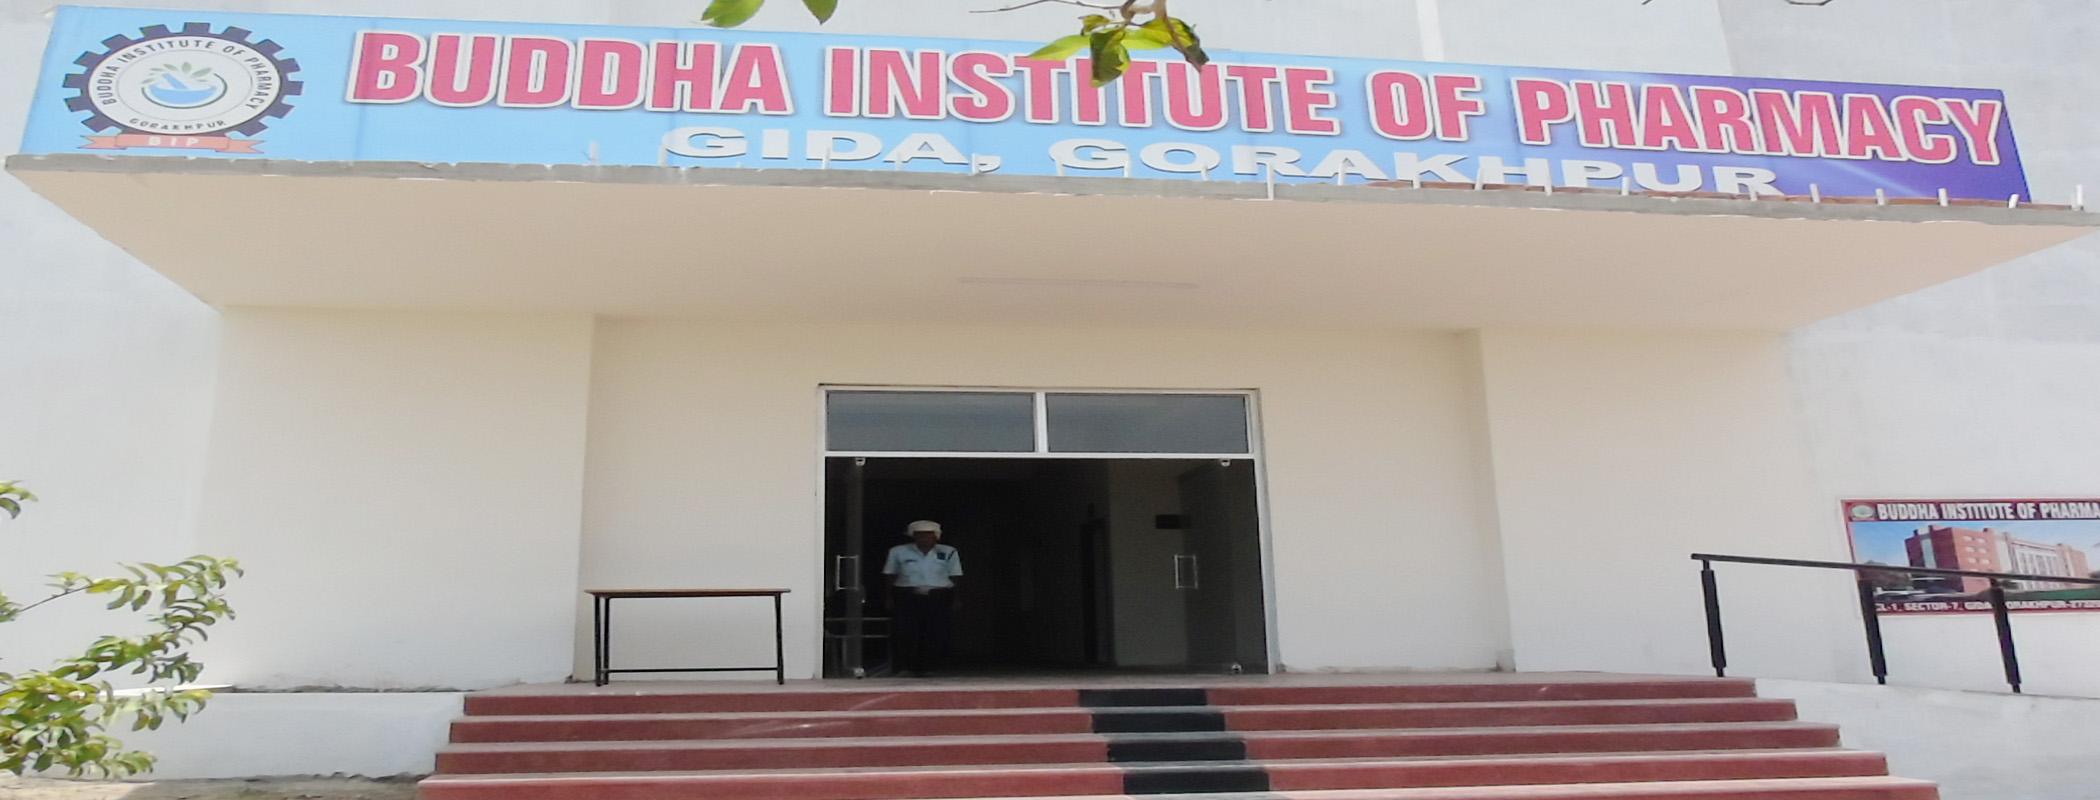 Buddha Institute Of Pharmacy, Gorakhpur